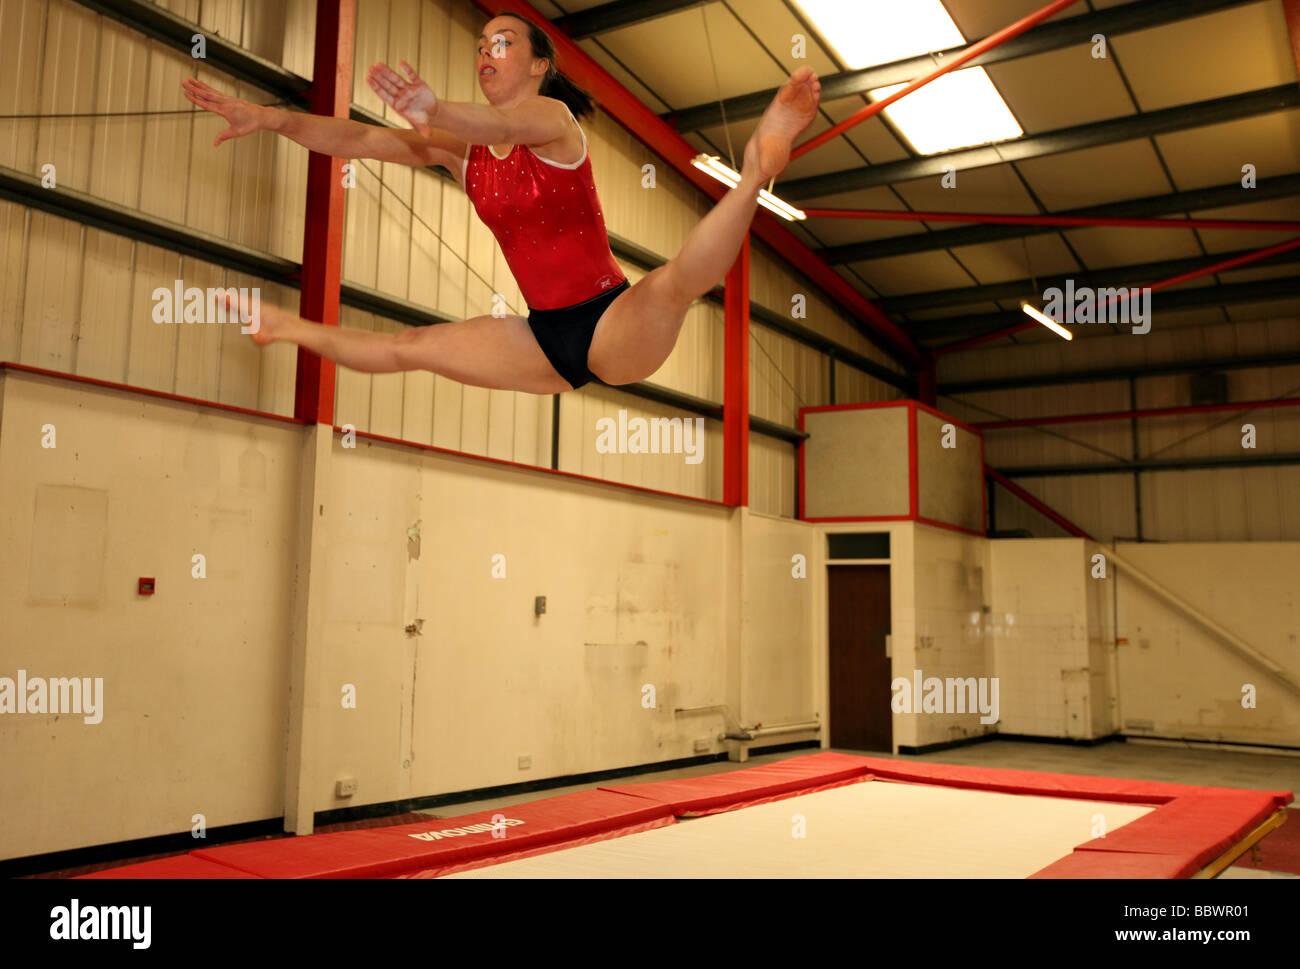 Doble campeón europeo de gimnasia Beth Tweddle en un lugar de capacitación cerca de Liverpool, Reino Unido. Imagen De Stock